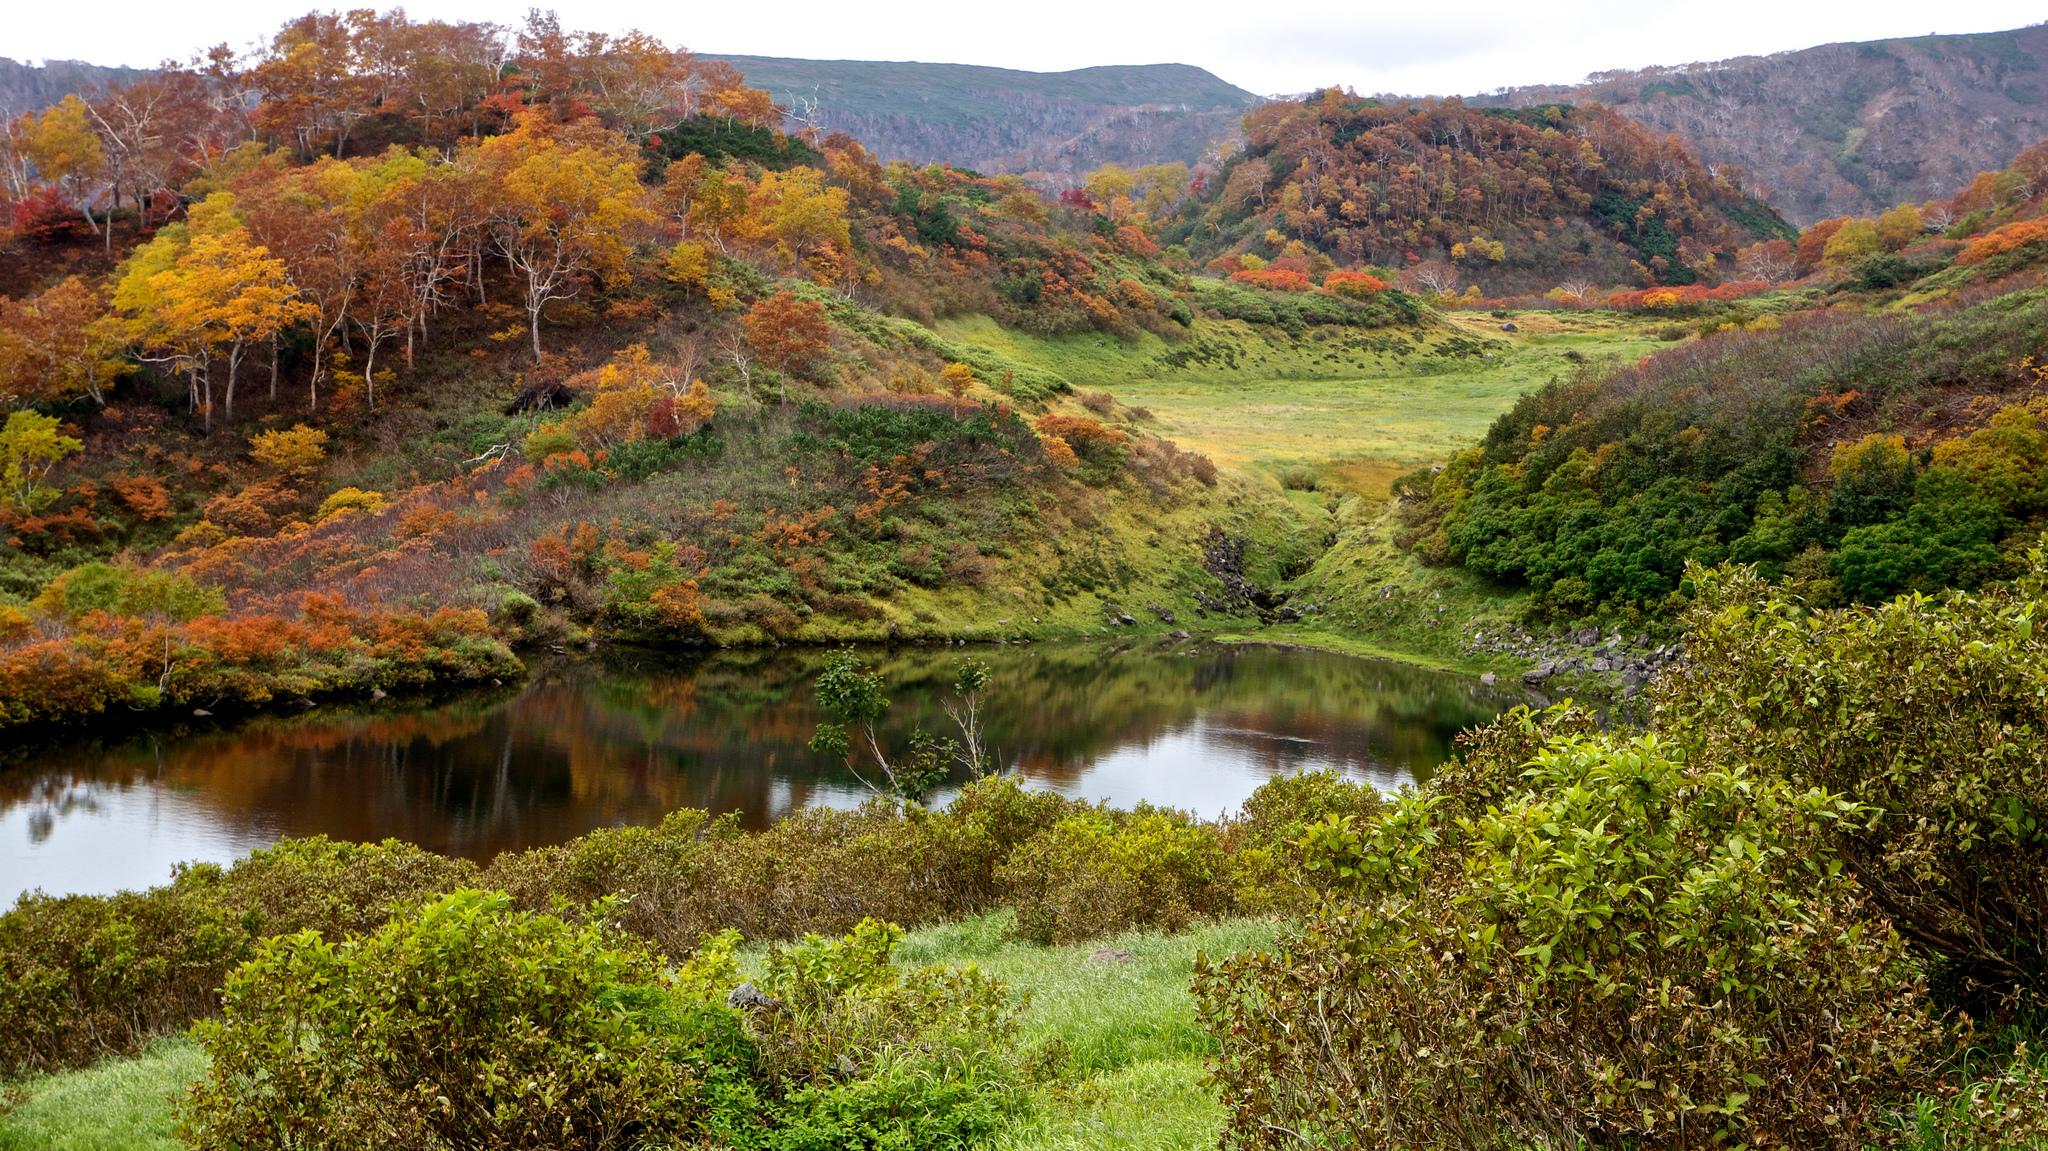 Pemandangan musim gugur di jalur hiking Kogen